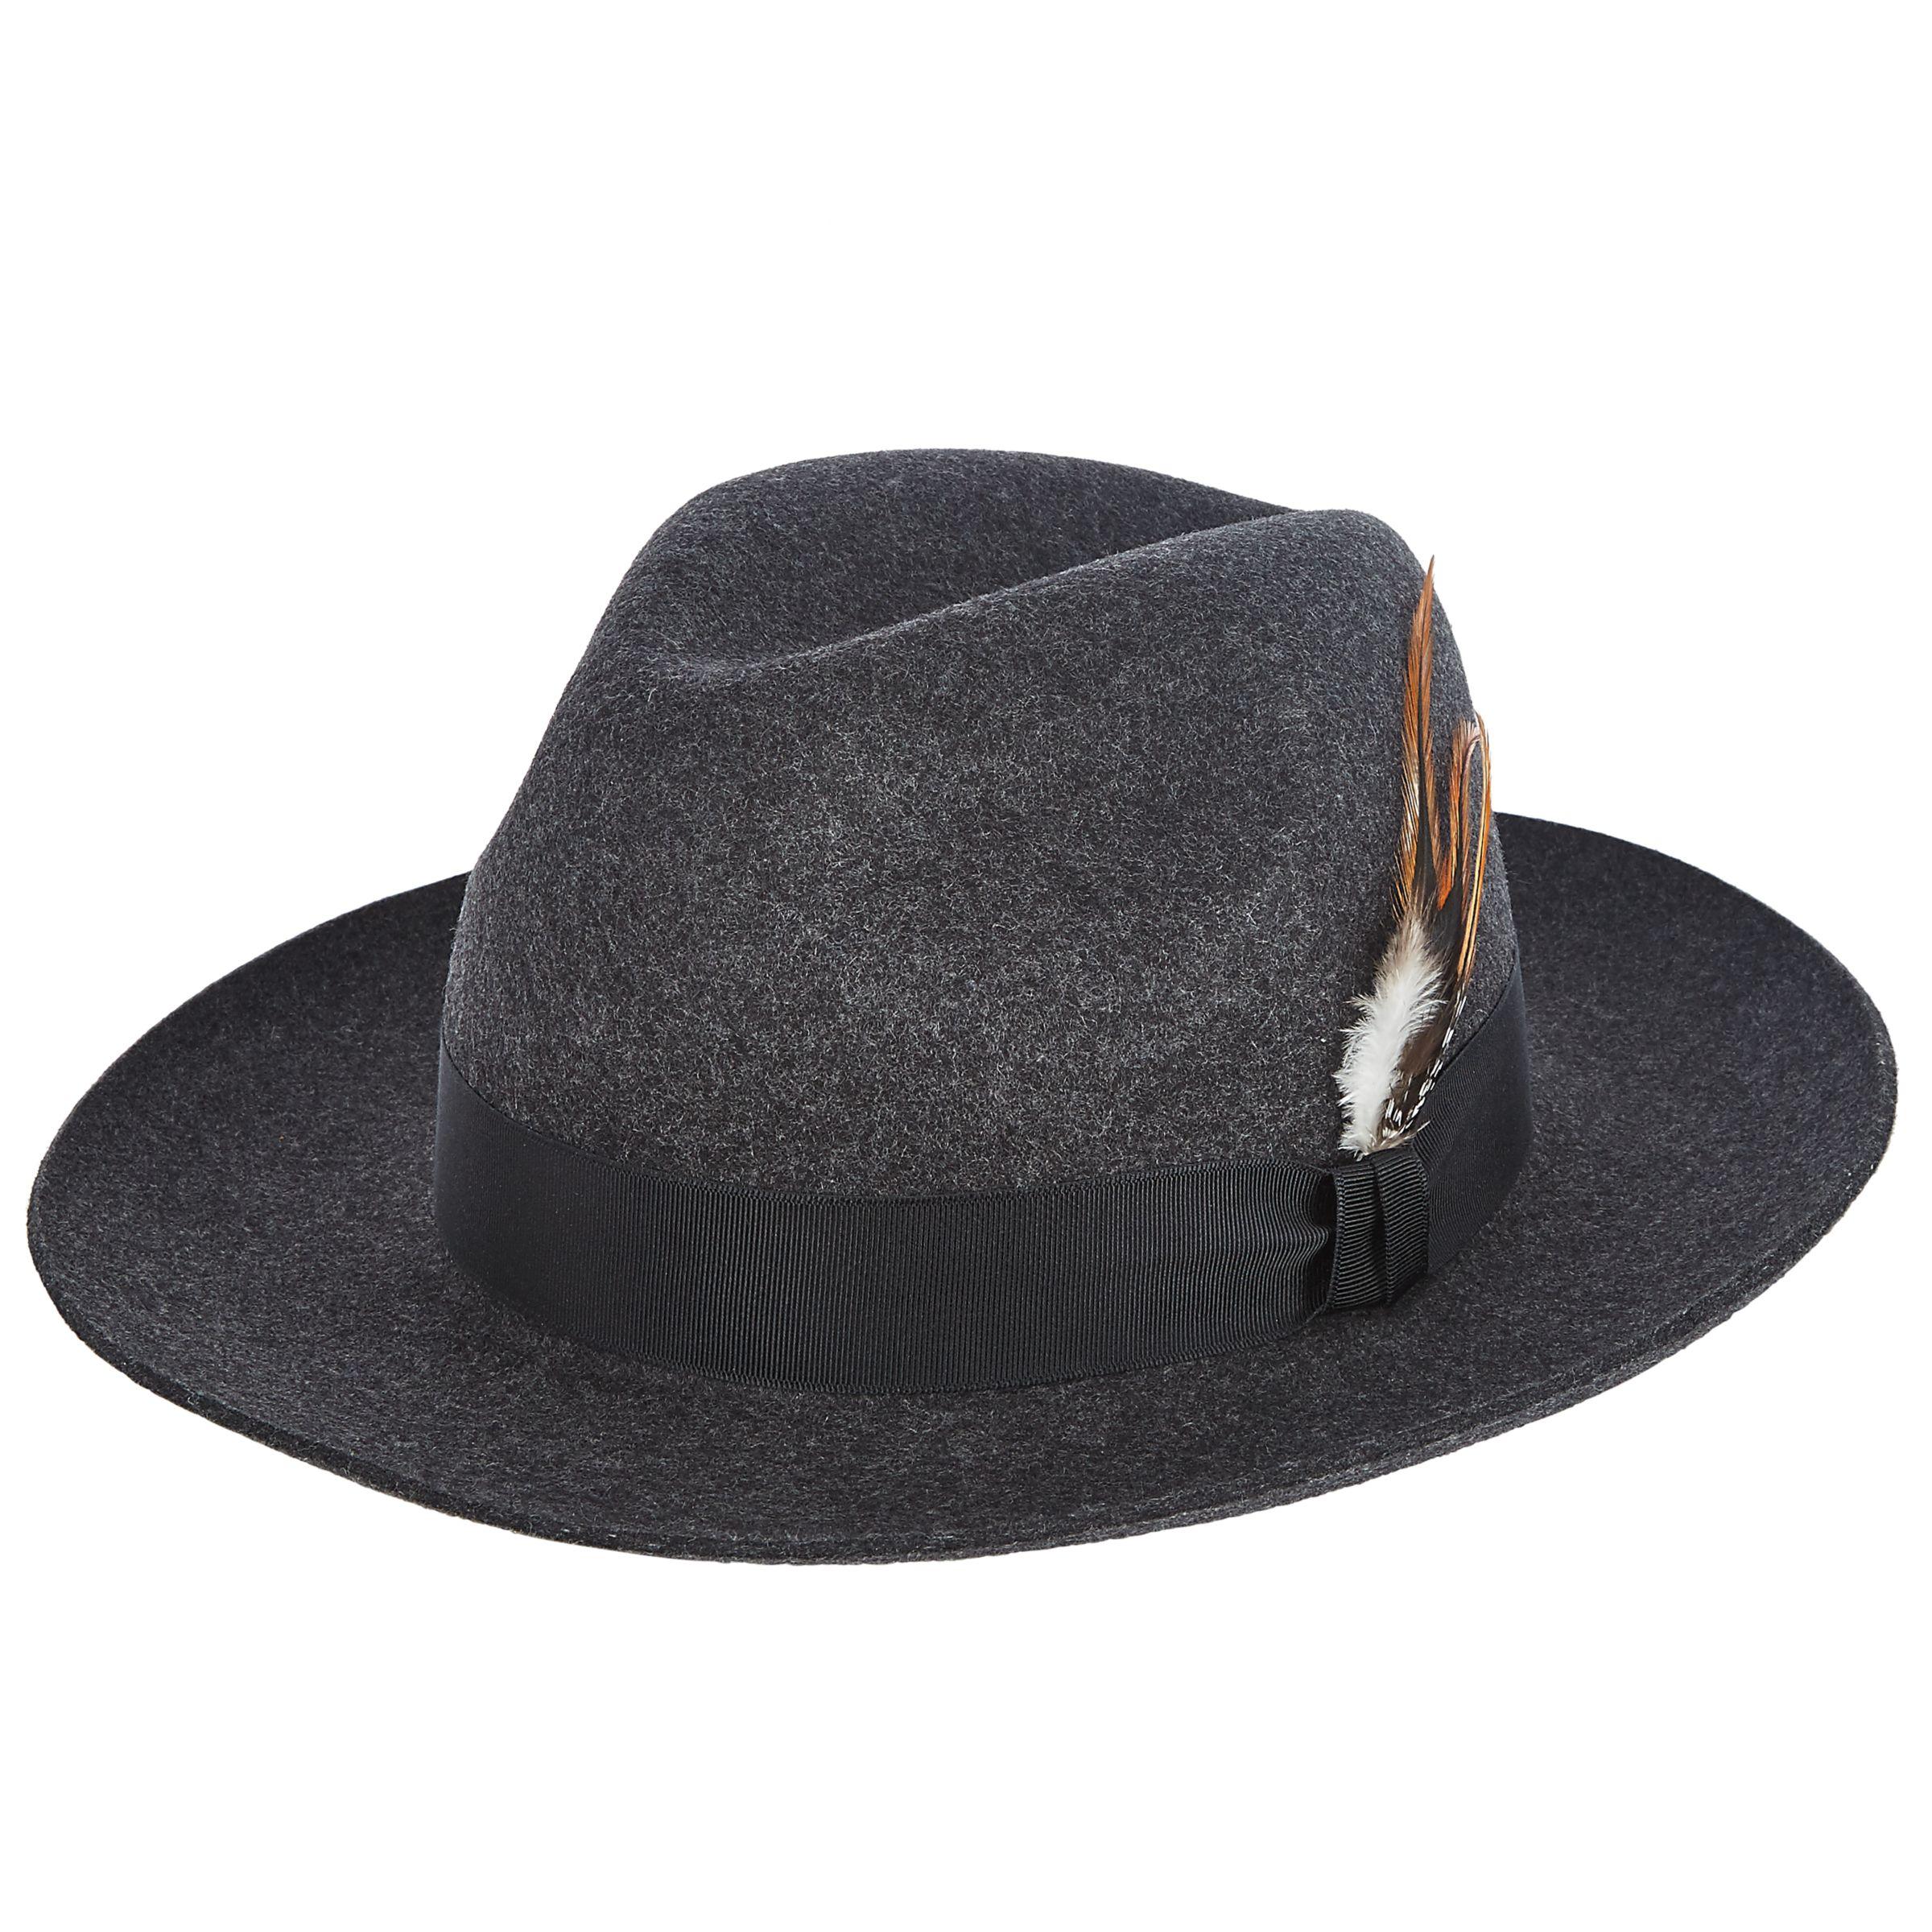 ddbea73245351 Christys  Grosvenor Fedora Hat